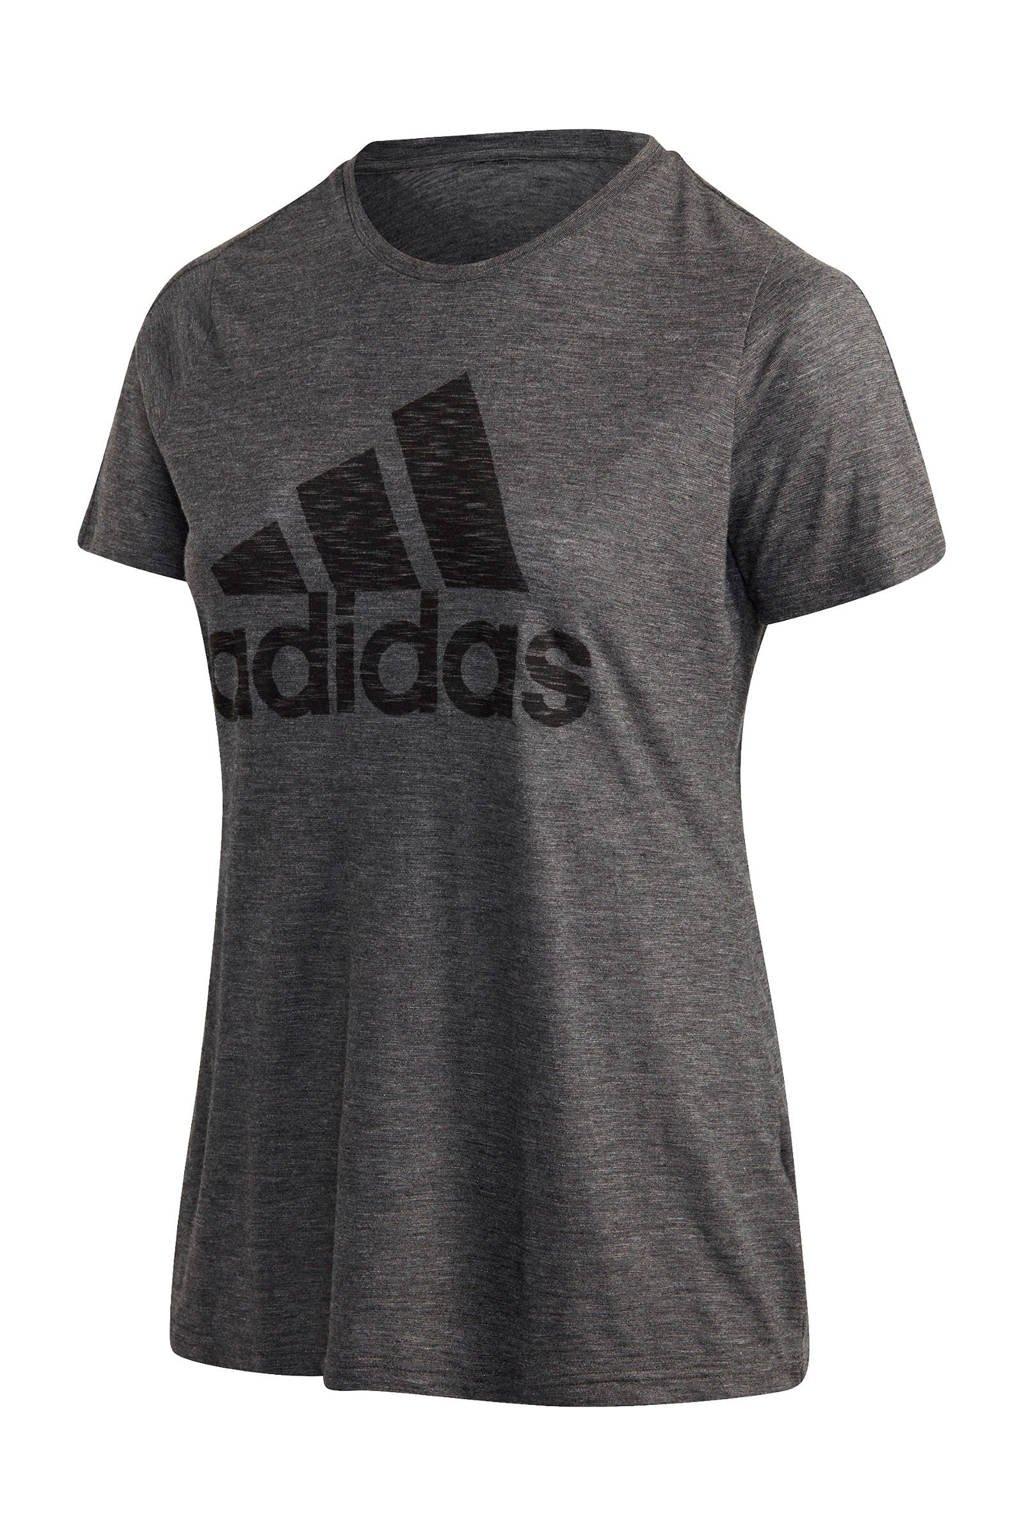 adidas Performance Plus Size sport T-shirt antraciet, Antraciet